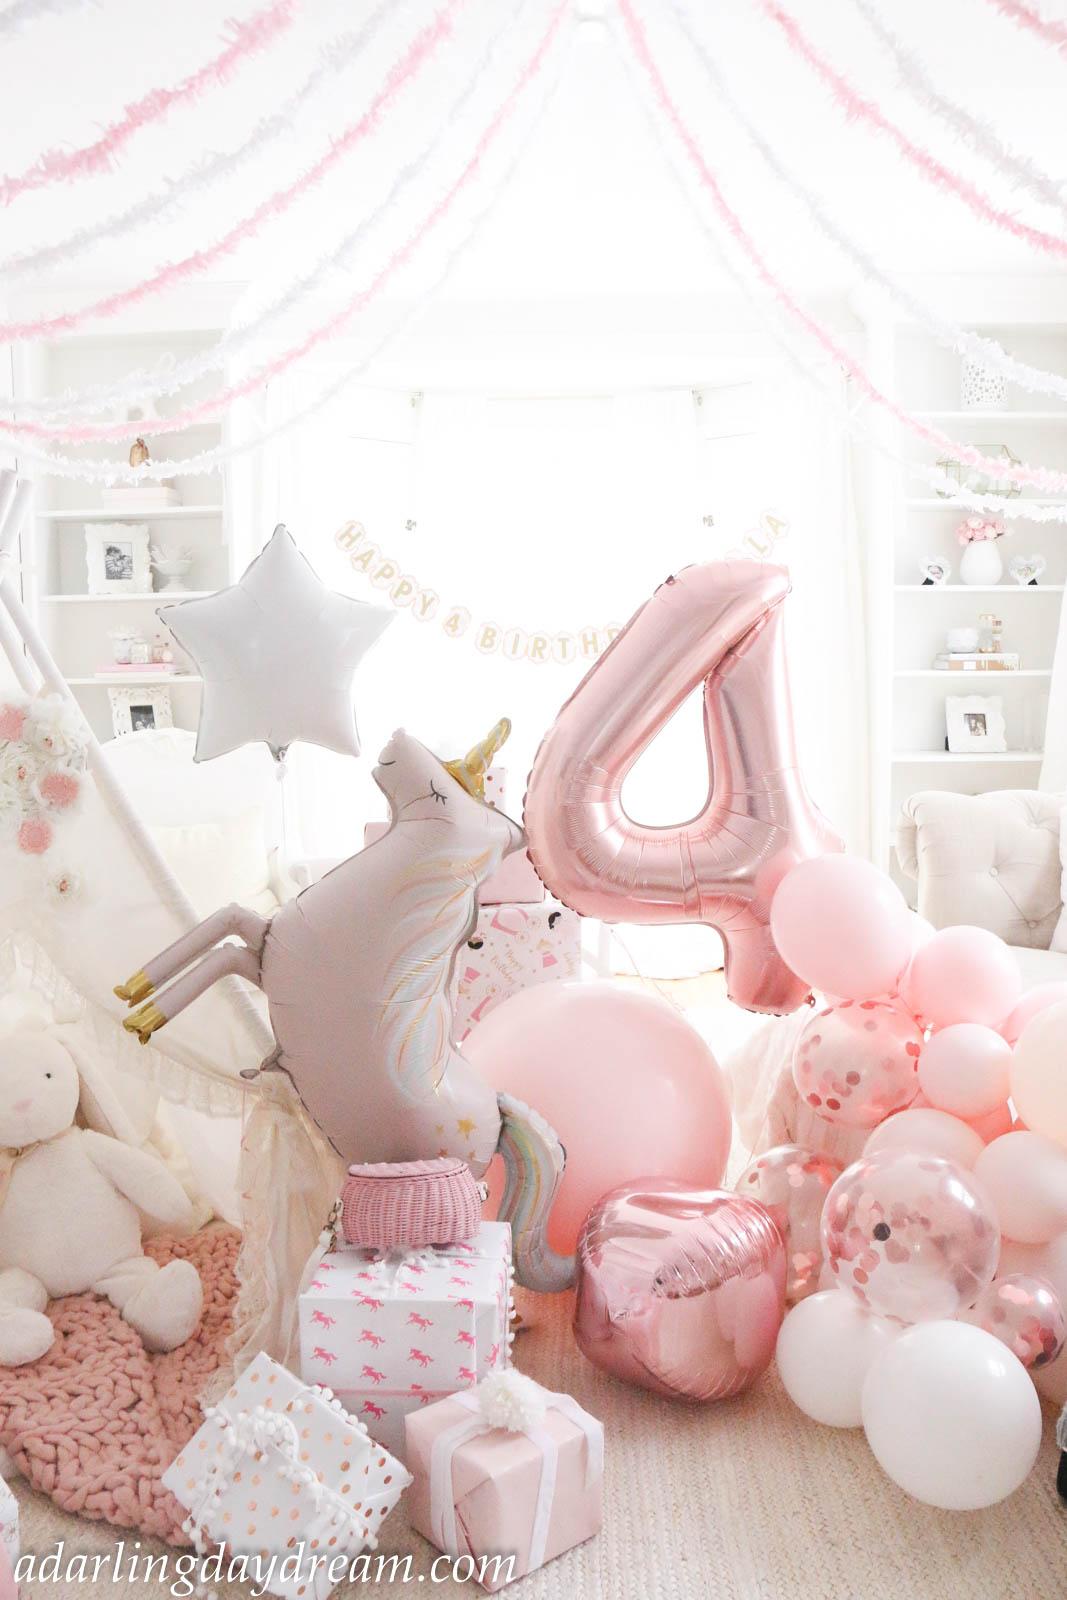 Bella-s-4th-Birthday-morning-surprise-14